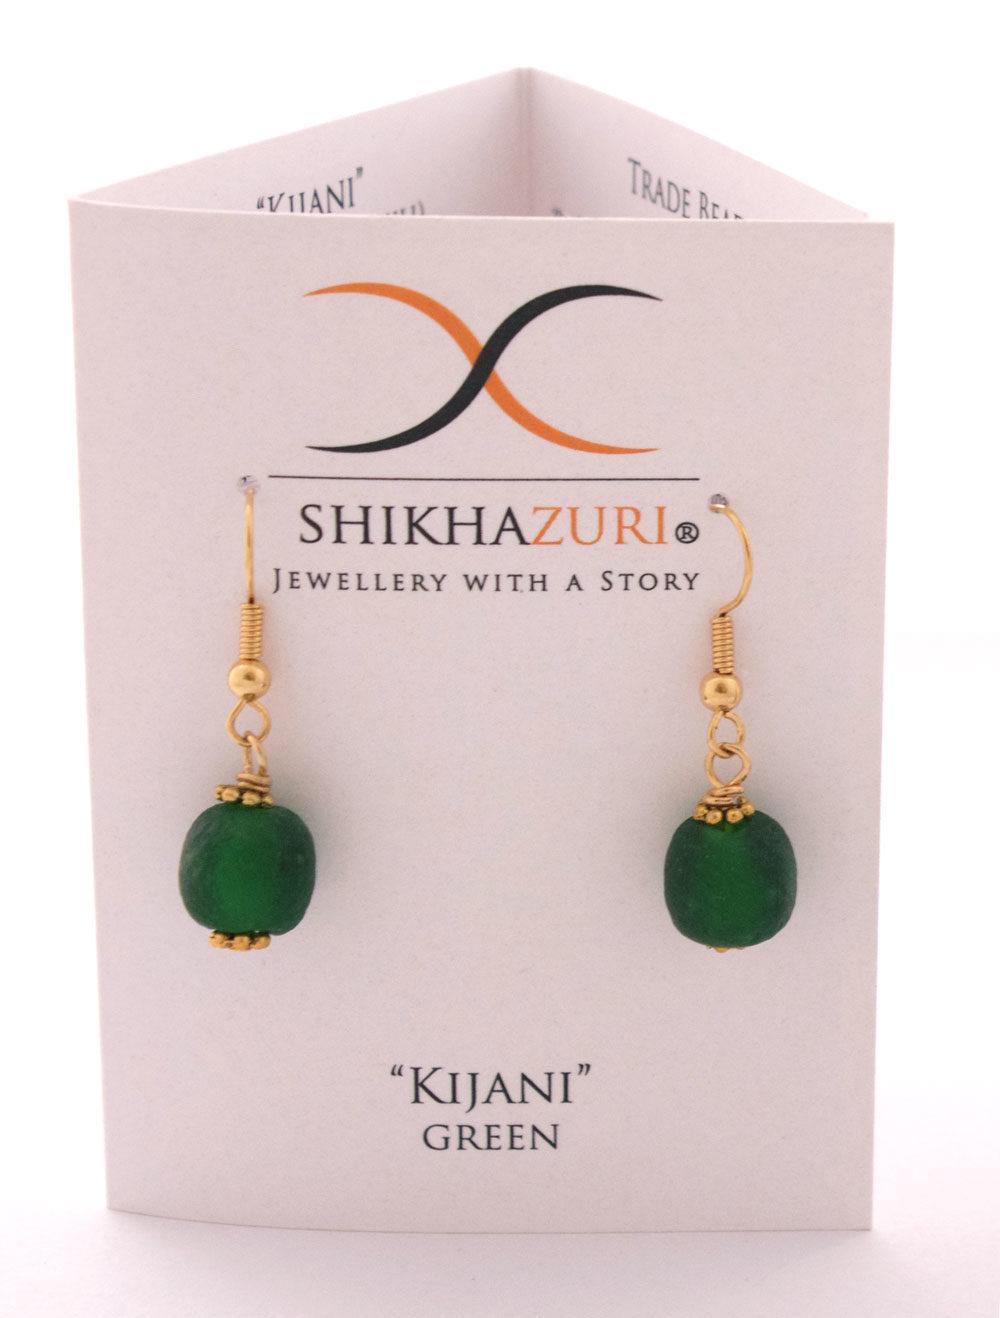 Green Jiona Earrings Carded by SHIKHAZURI